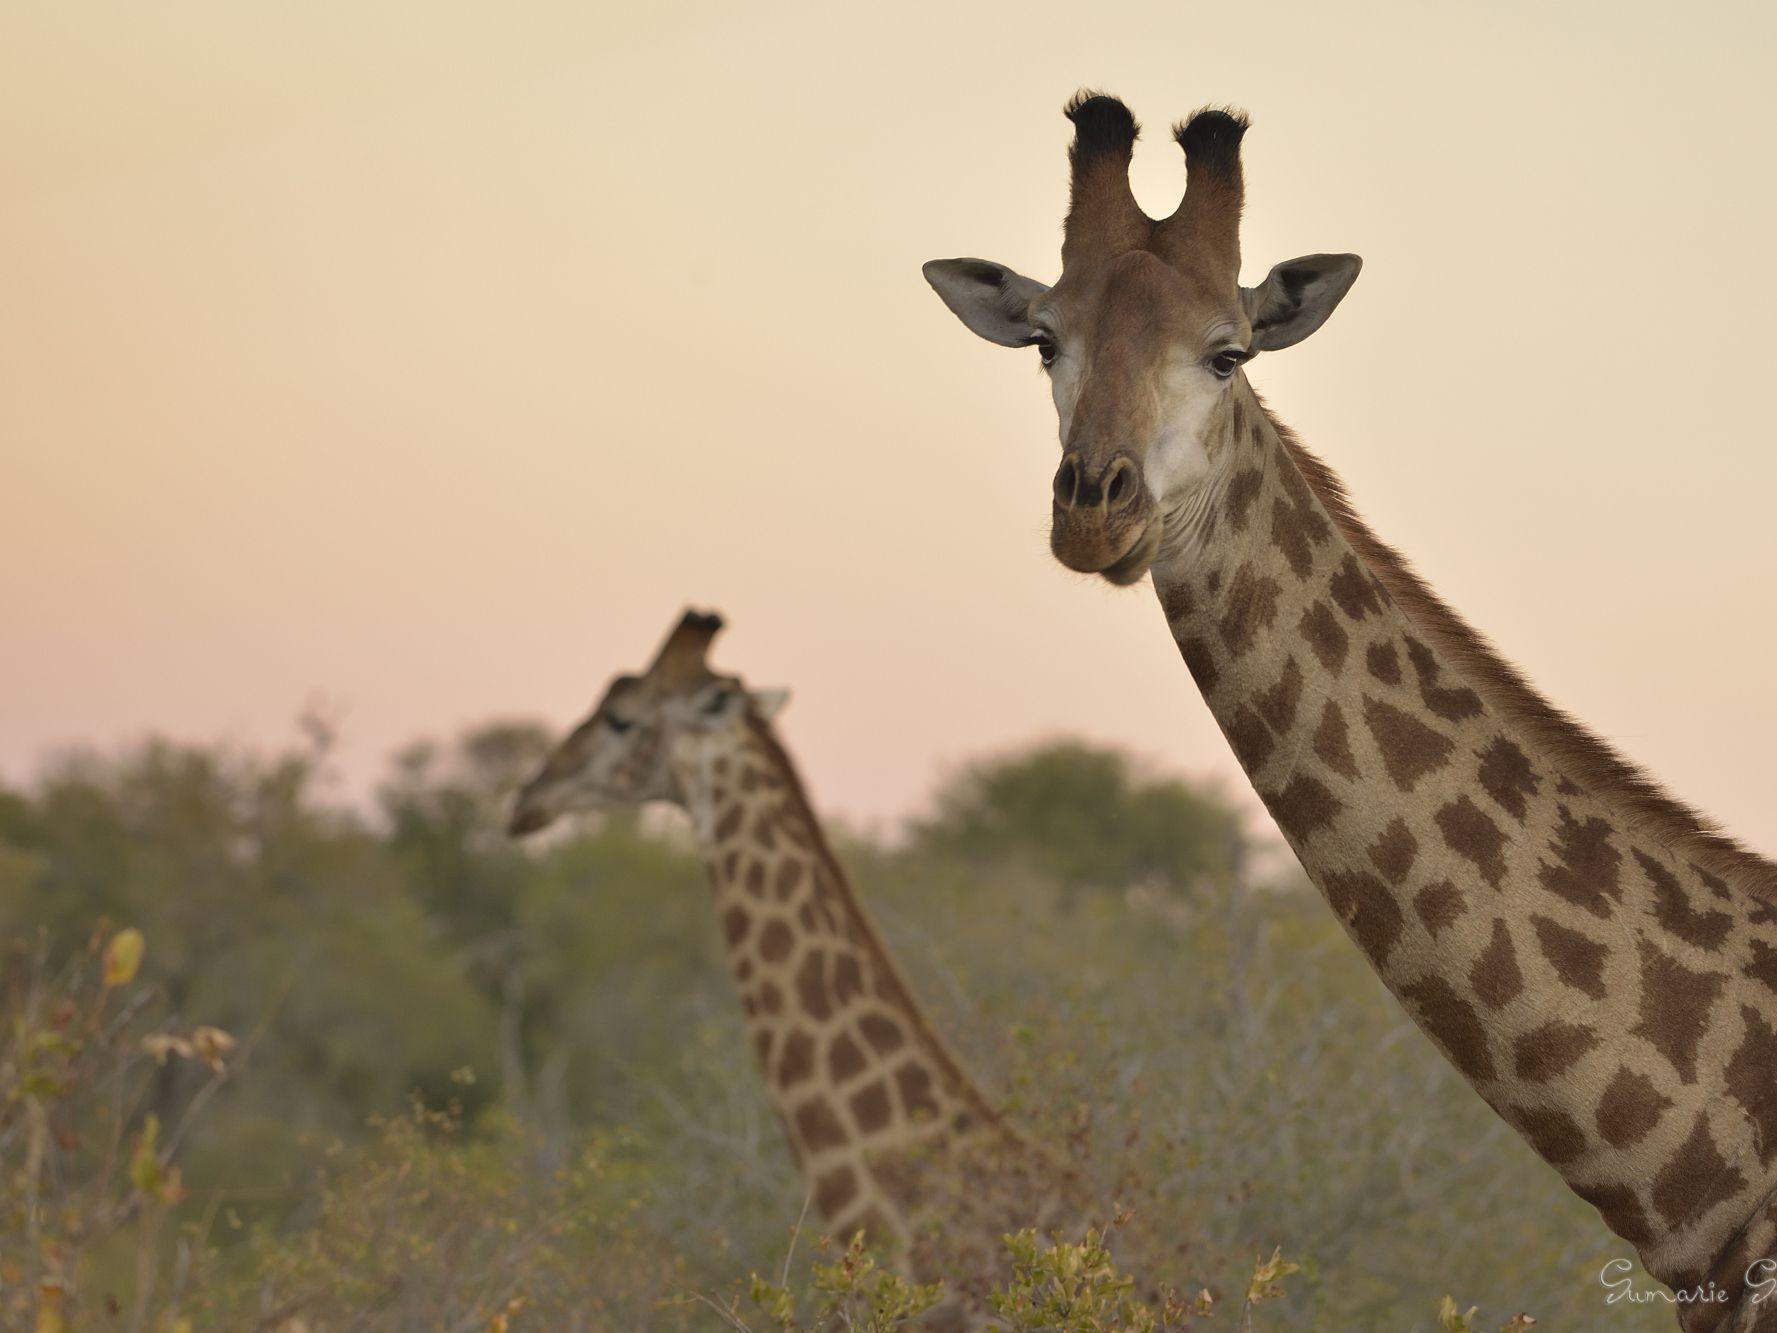 Wild Giraffes Are Suffering A Silent Extinction